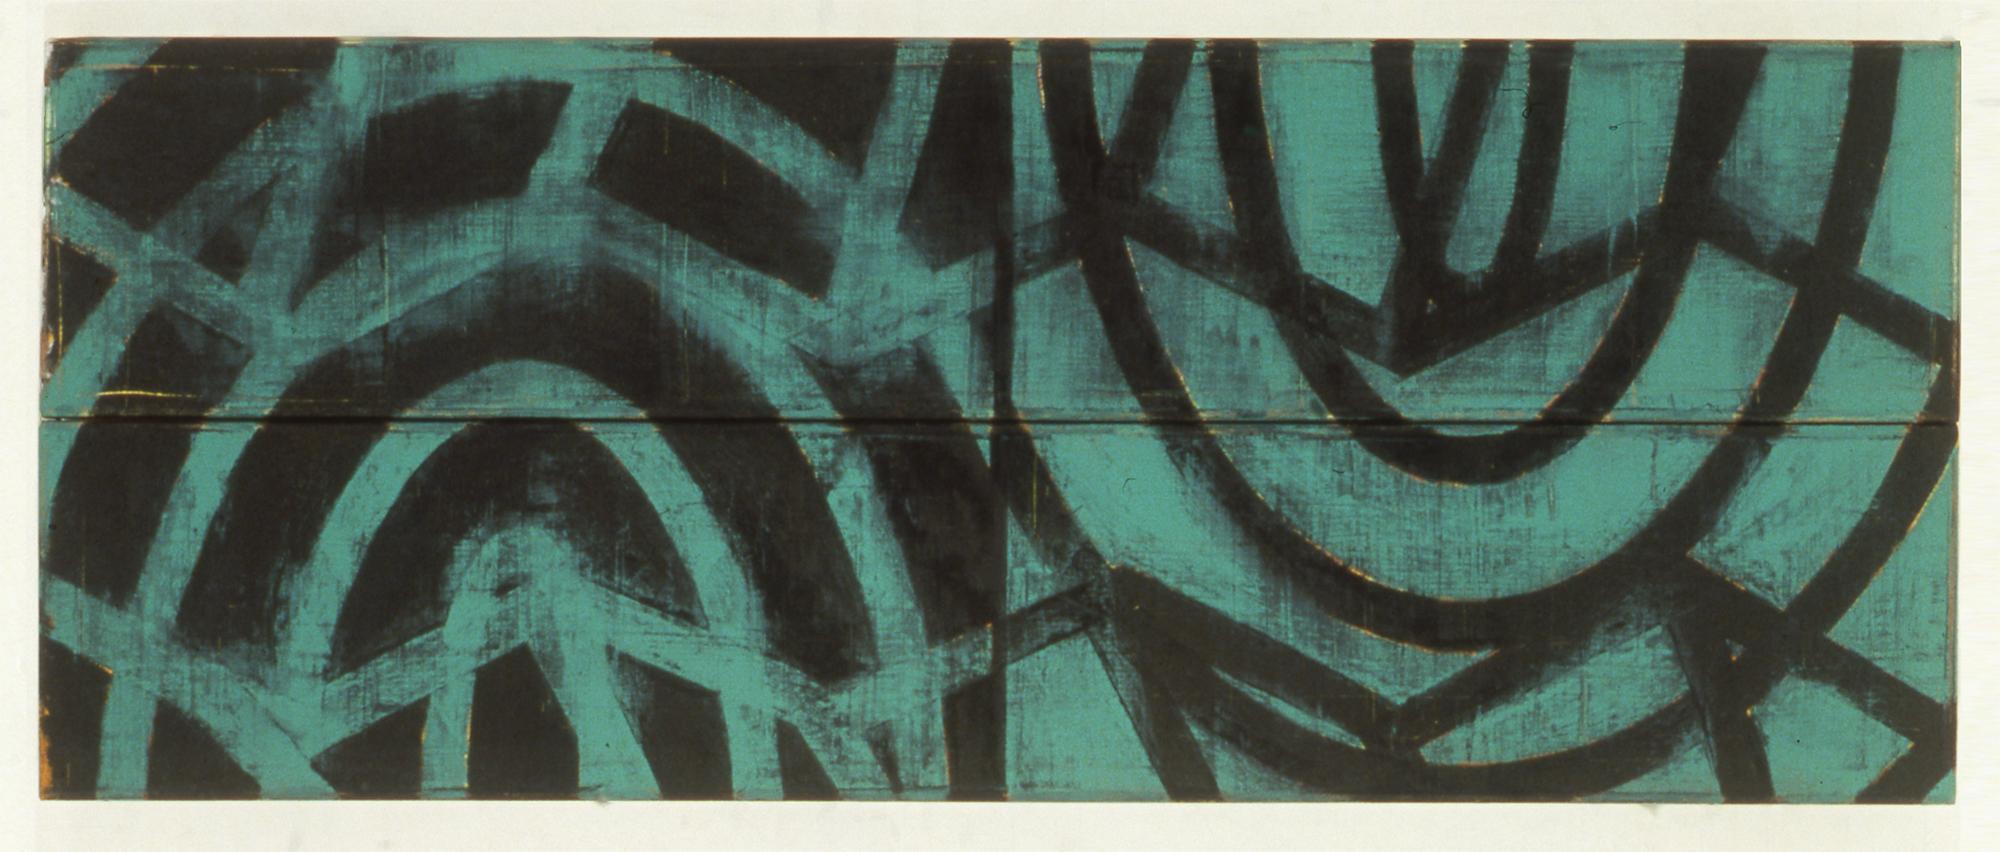 David Row - Vert De Grece